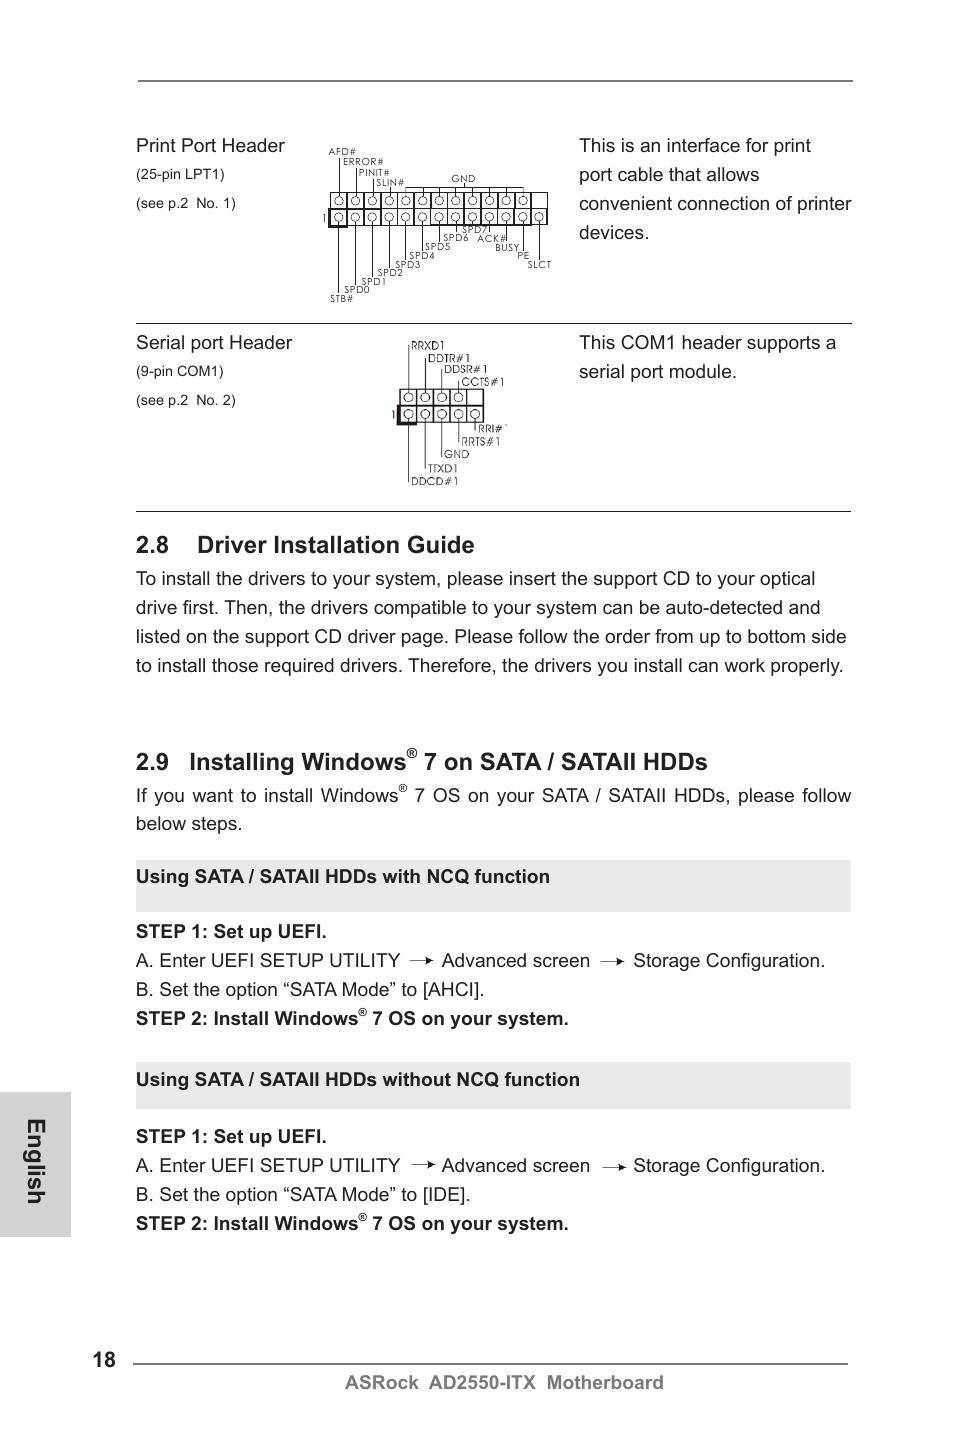 English 2 8 driver installation guide, 9 installing windows